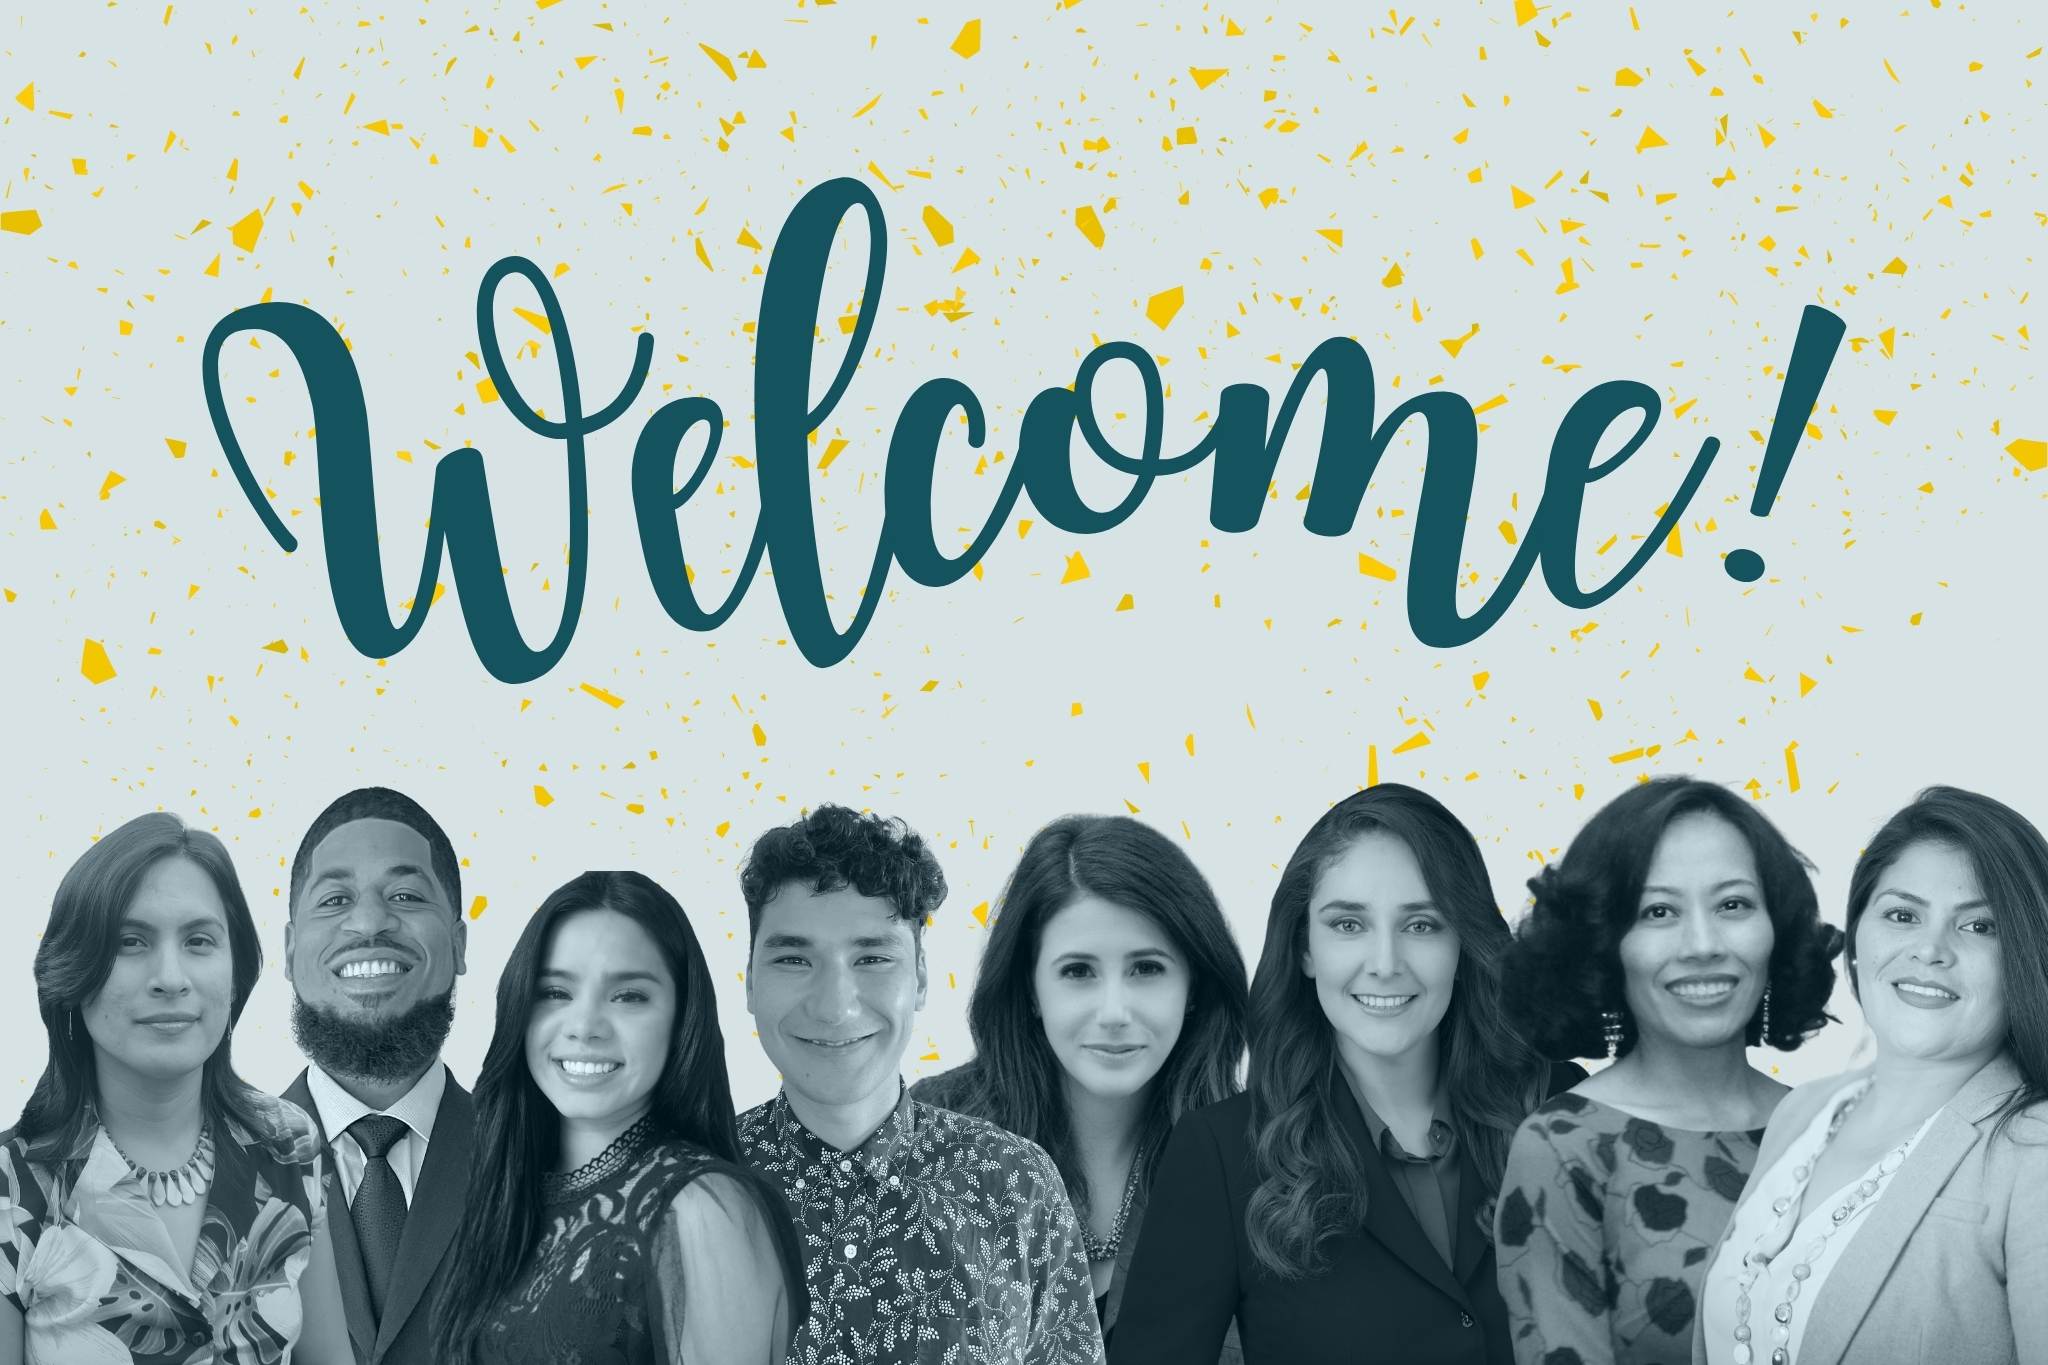 Welcome new team members: Xitlali, David, Farah, Edwin, Melissa, Oralia, Thai, Laura